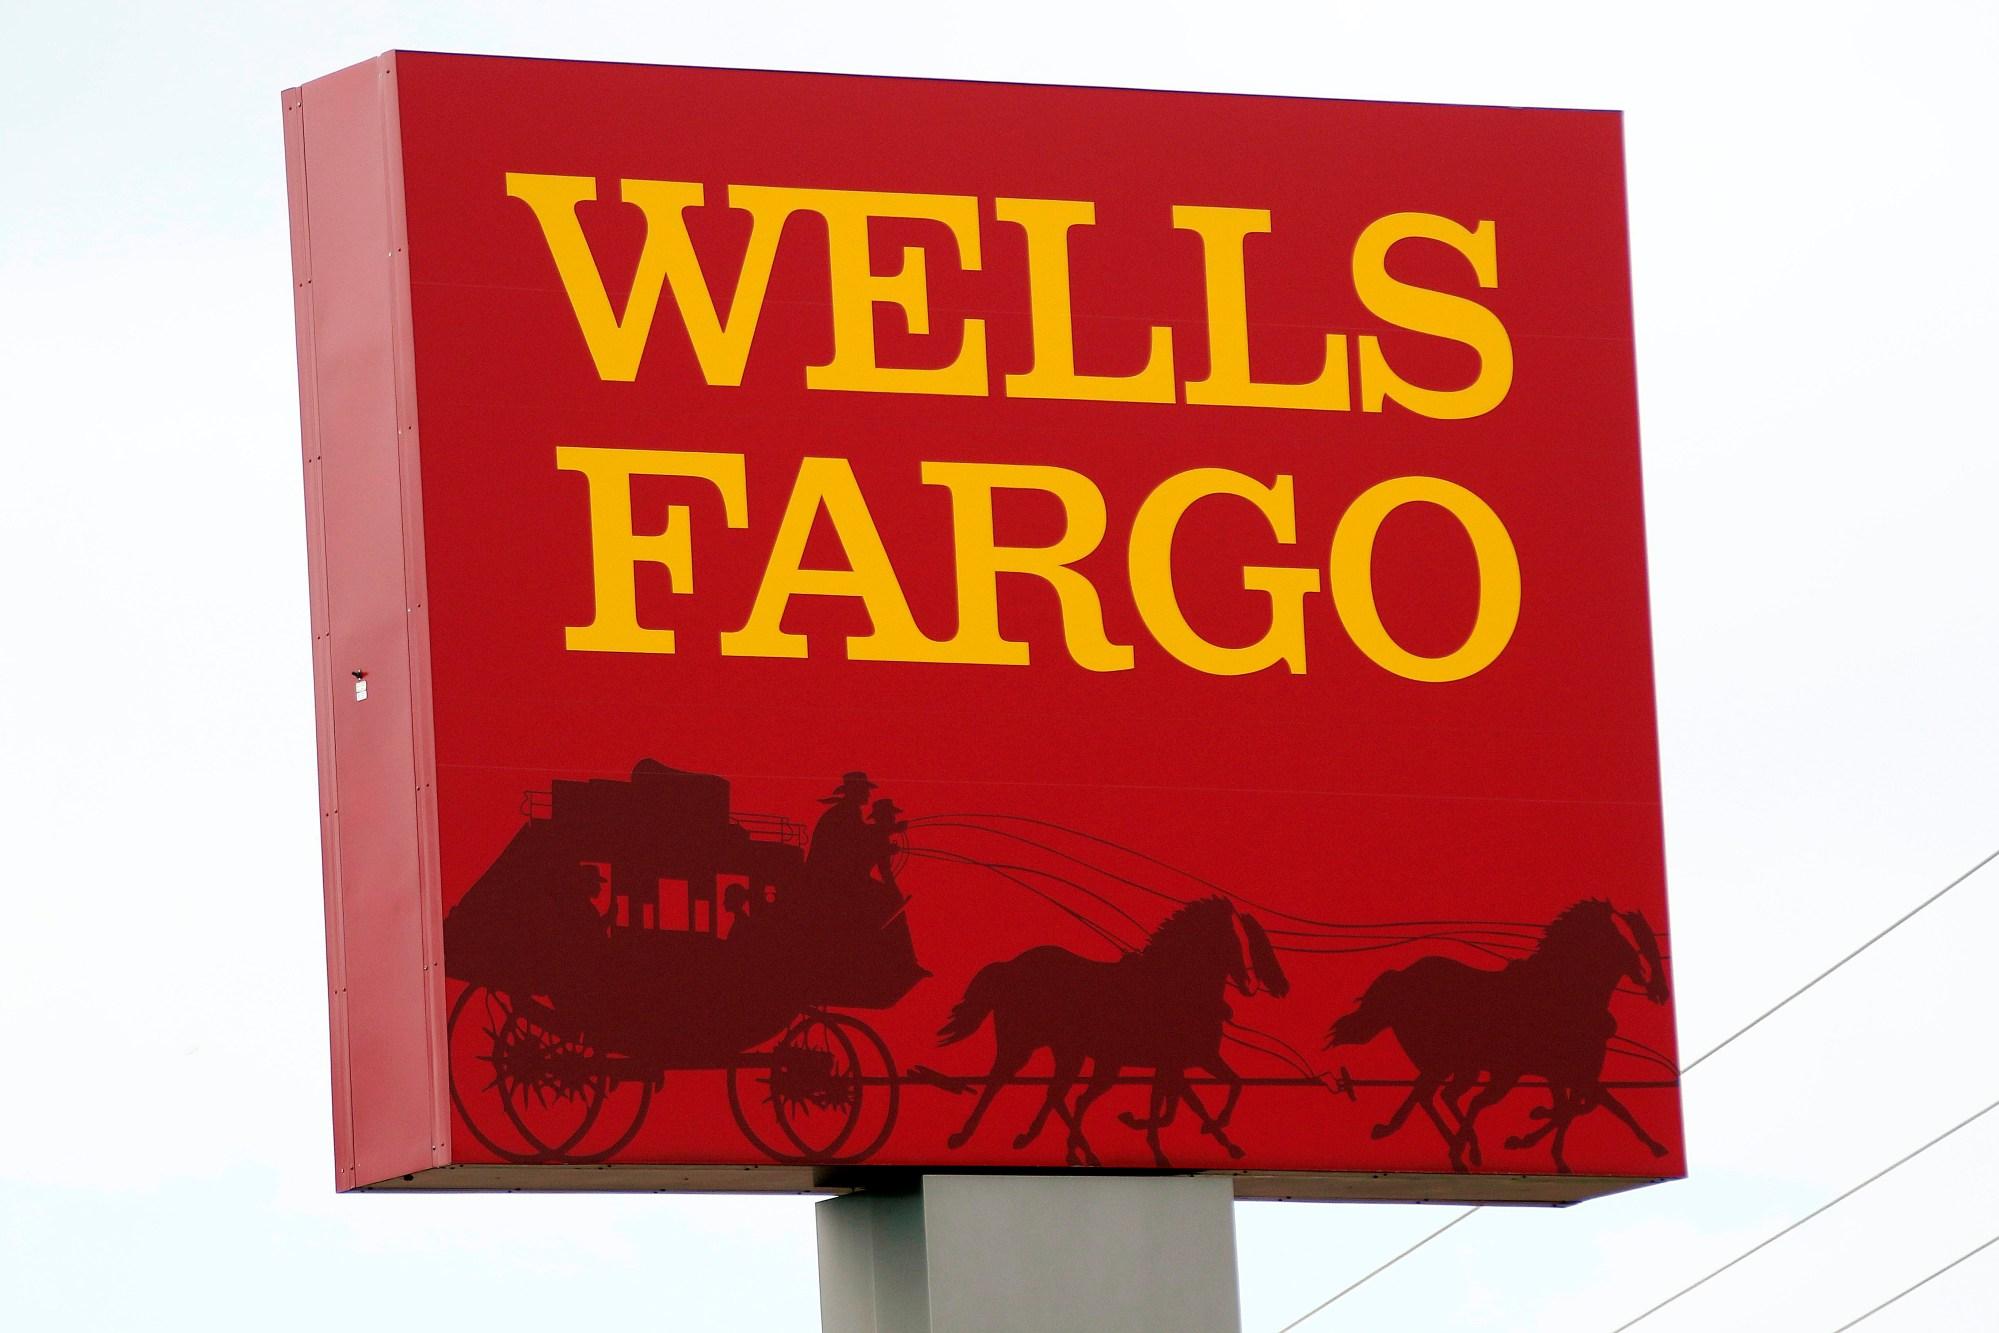 Wells_Fargo_Fine_43183-159532.jpg40181880